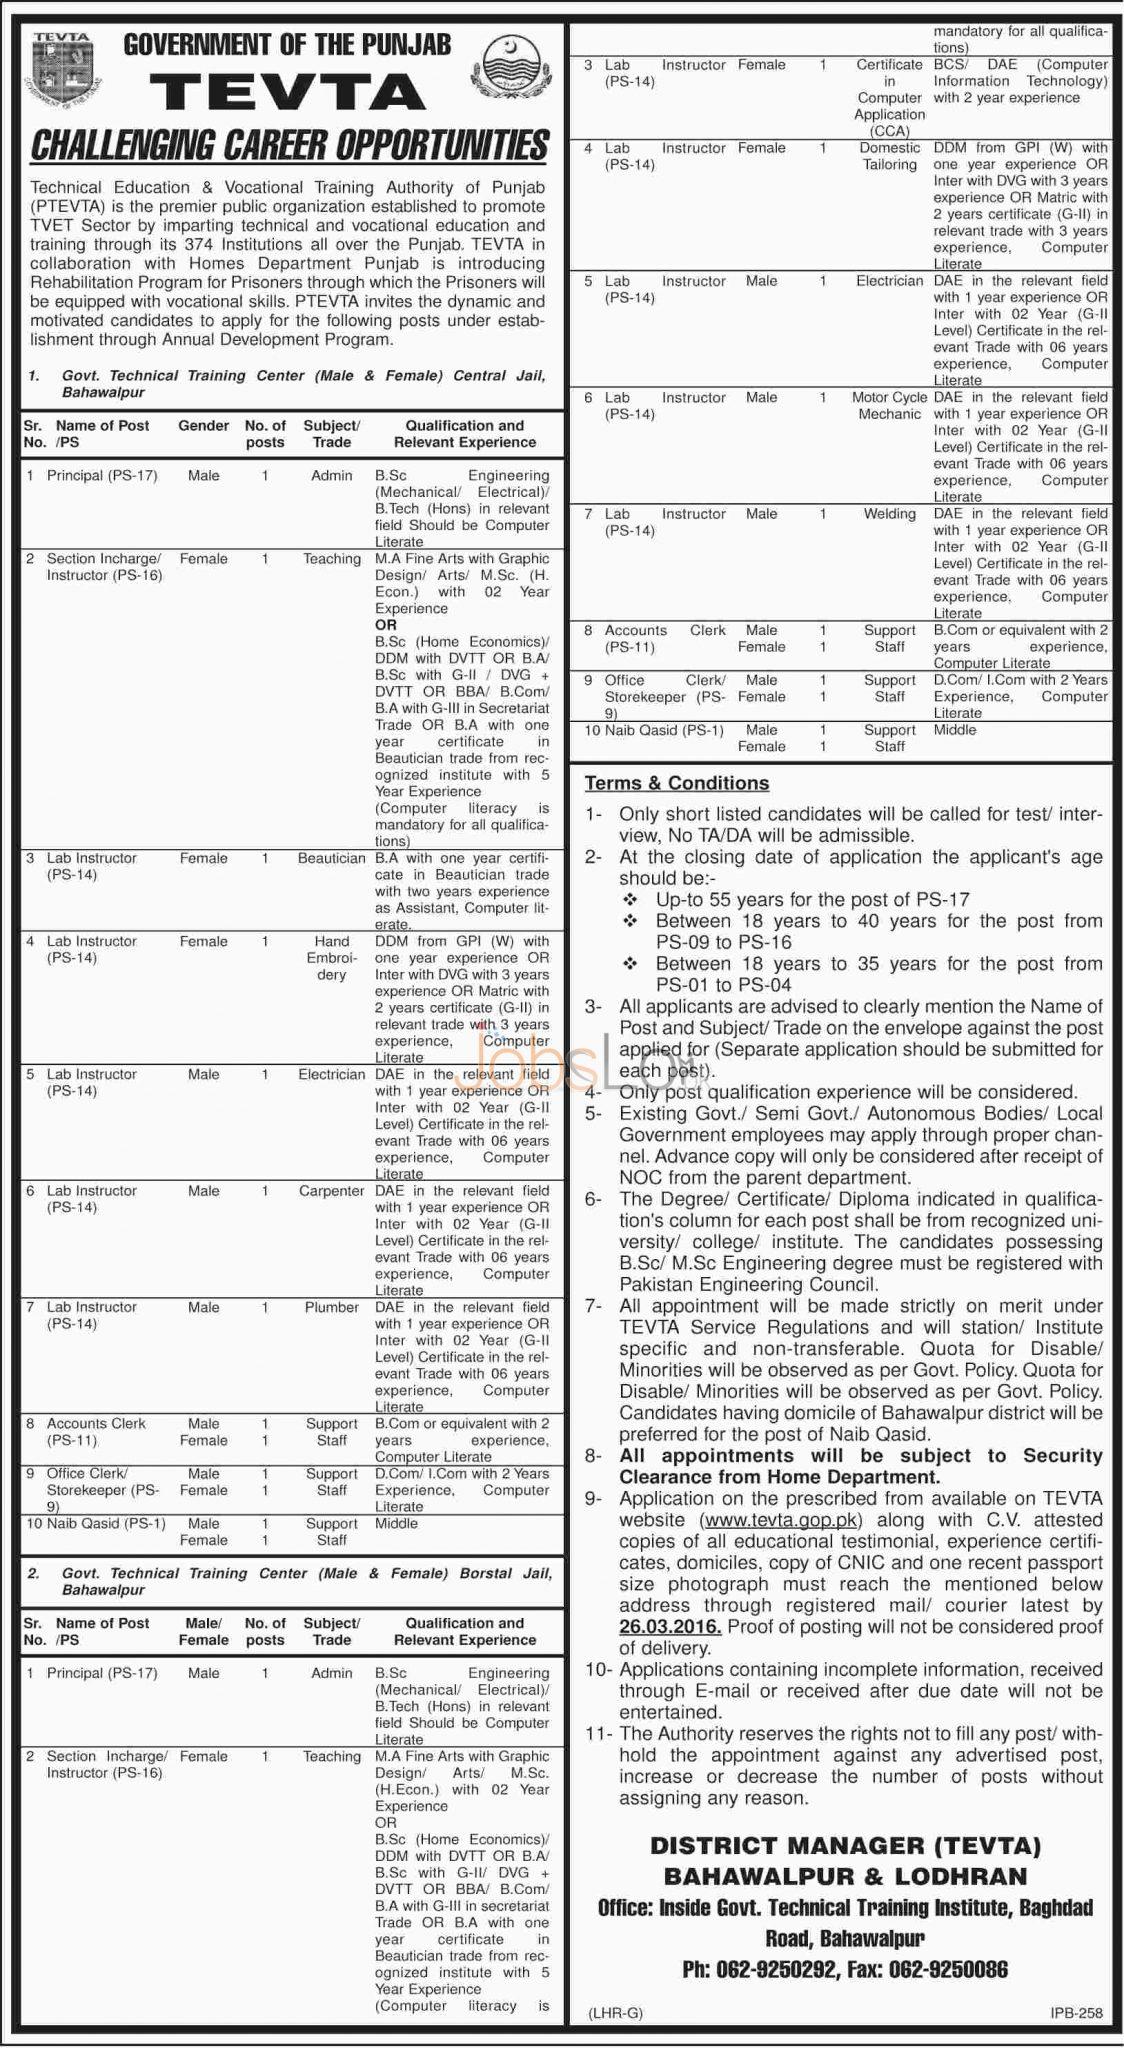 Recruitment Offers in TEVTA Punjab 2016 in Bahwalpur For Principal, Instructor & Accounts Clerk